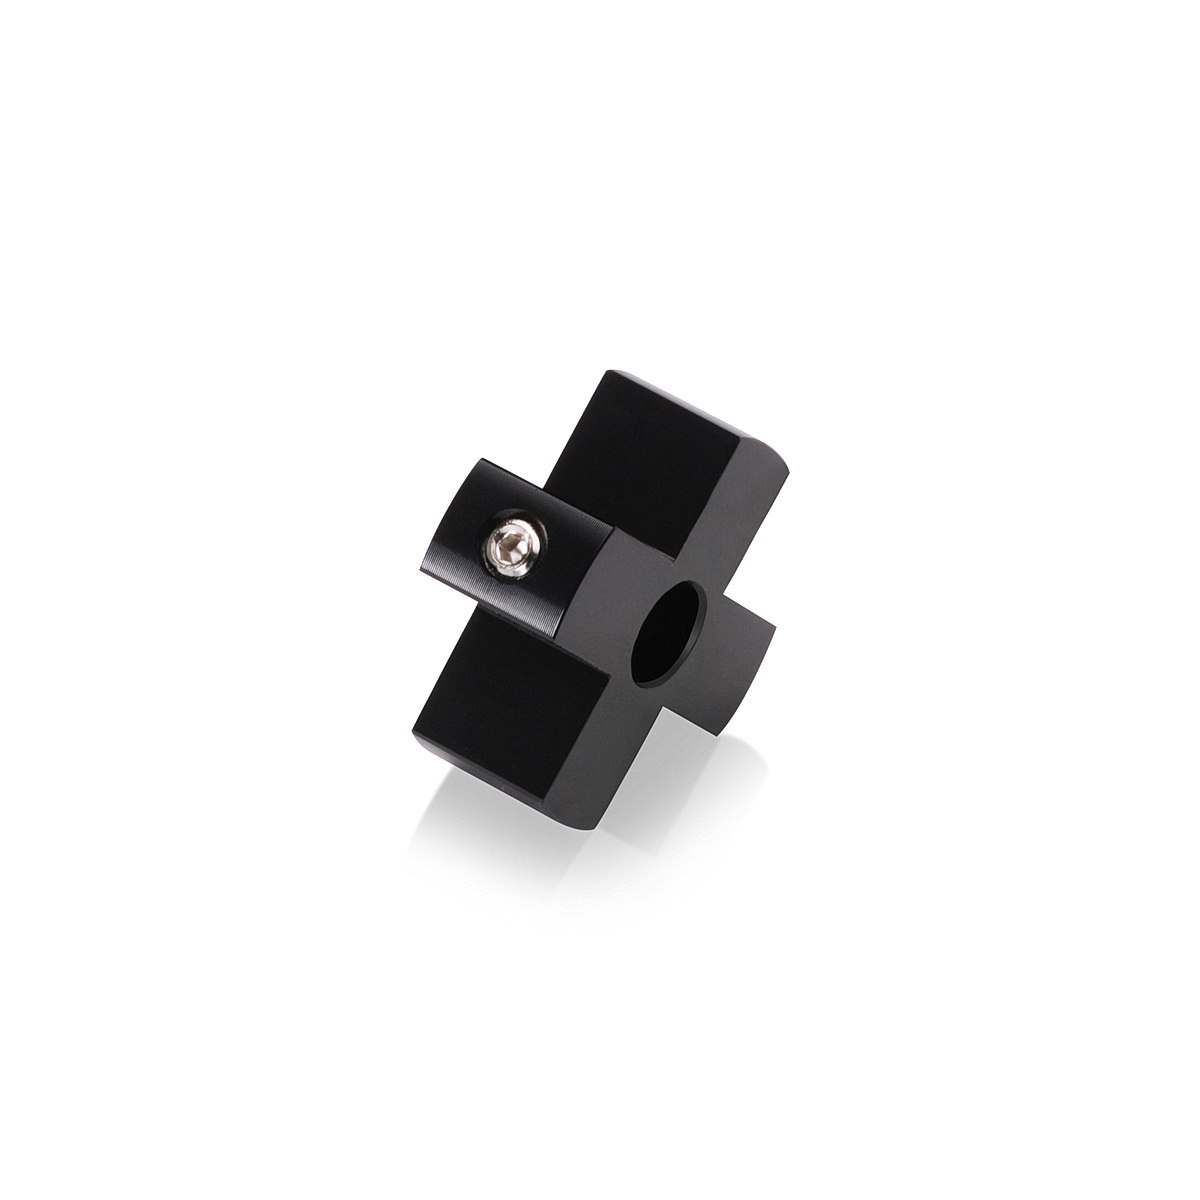 4-Way Standoffs Hub, Diameter: 1 1/4'', Thickness: 1/2'', Black Anodized Aluminum